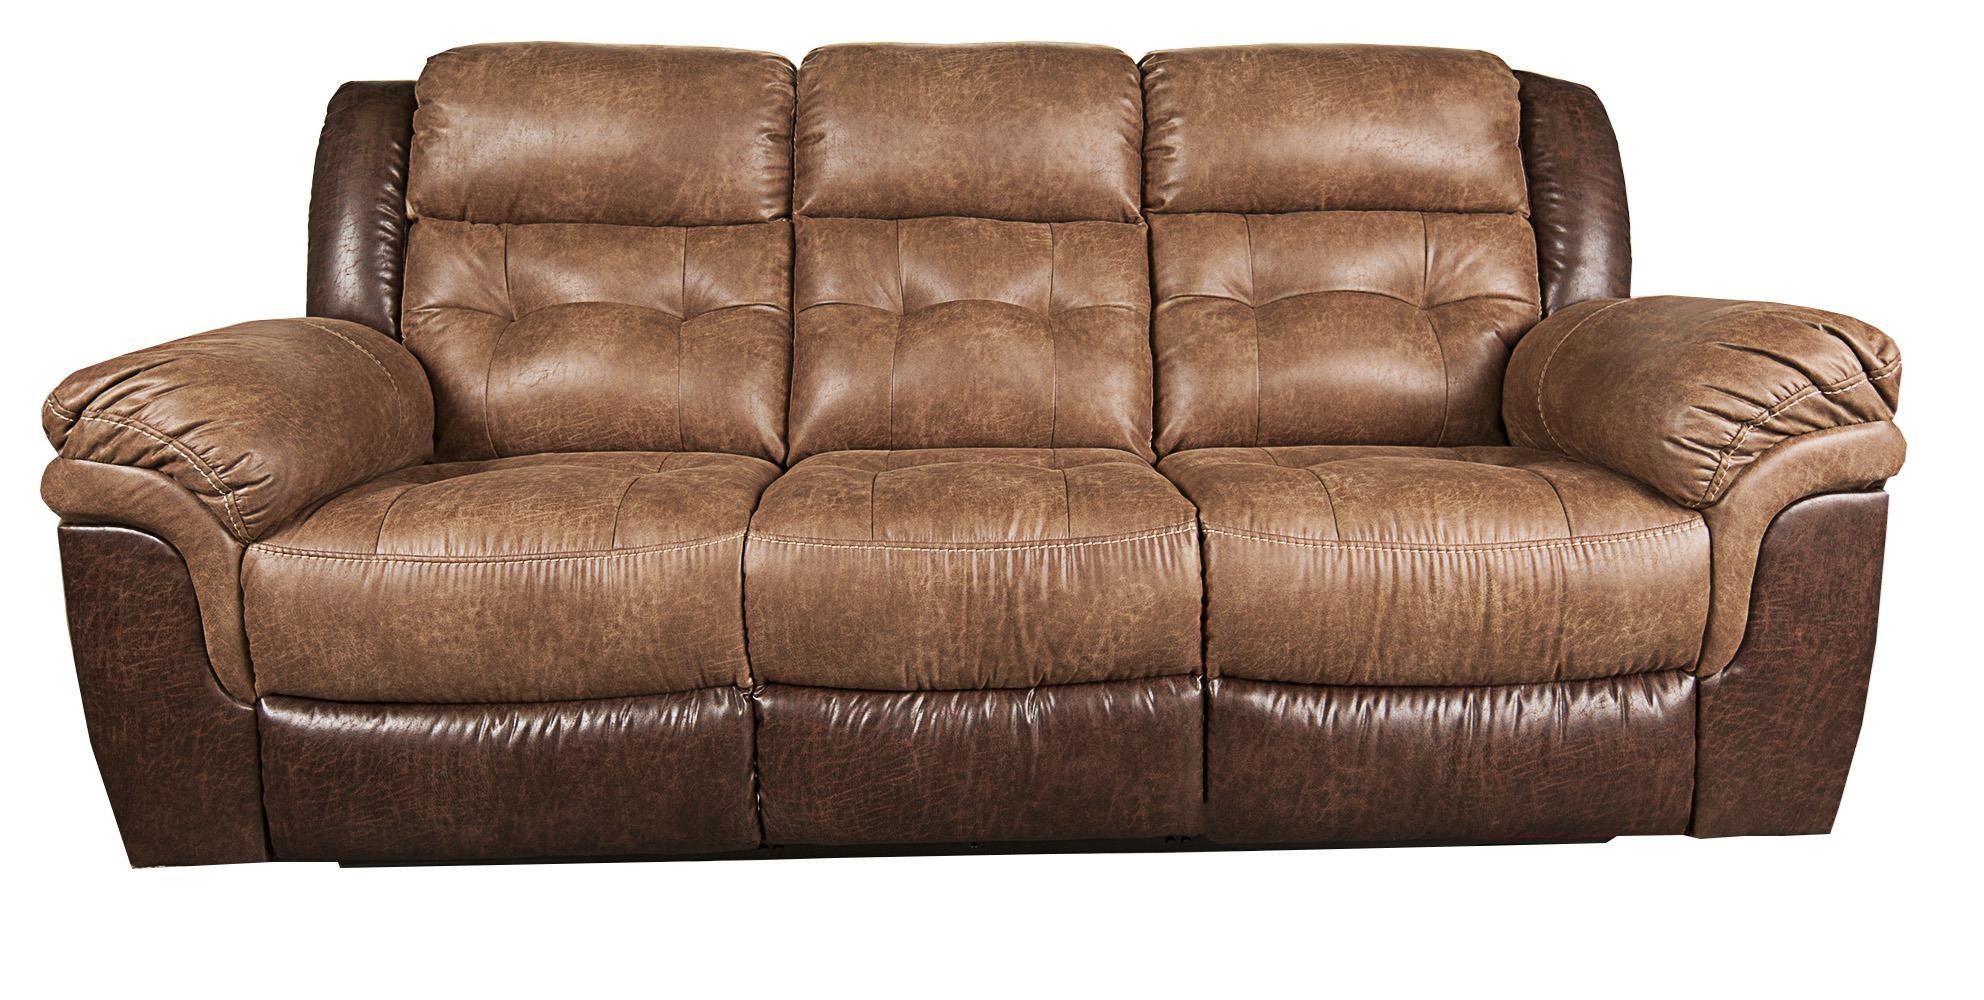 Montrell Montrell Reclining Sofa at Morris Home